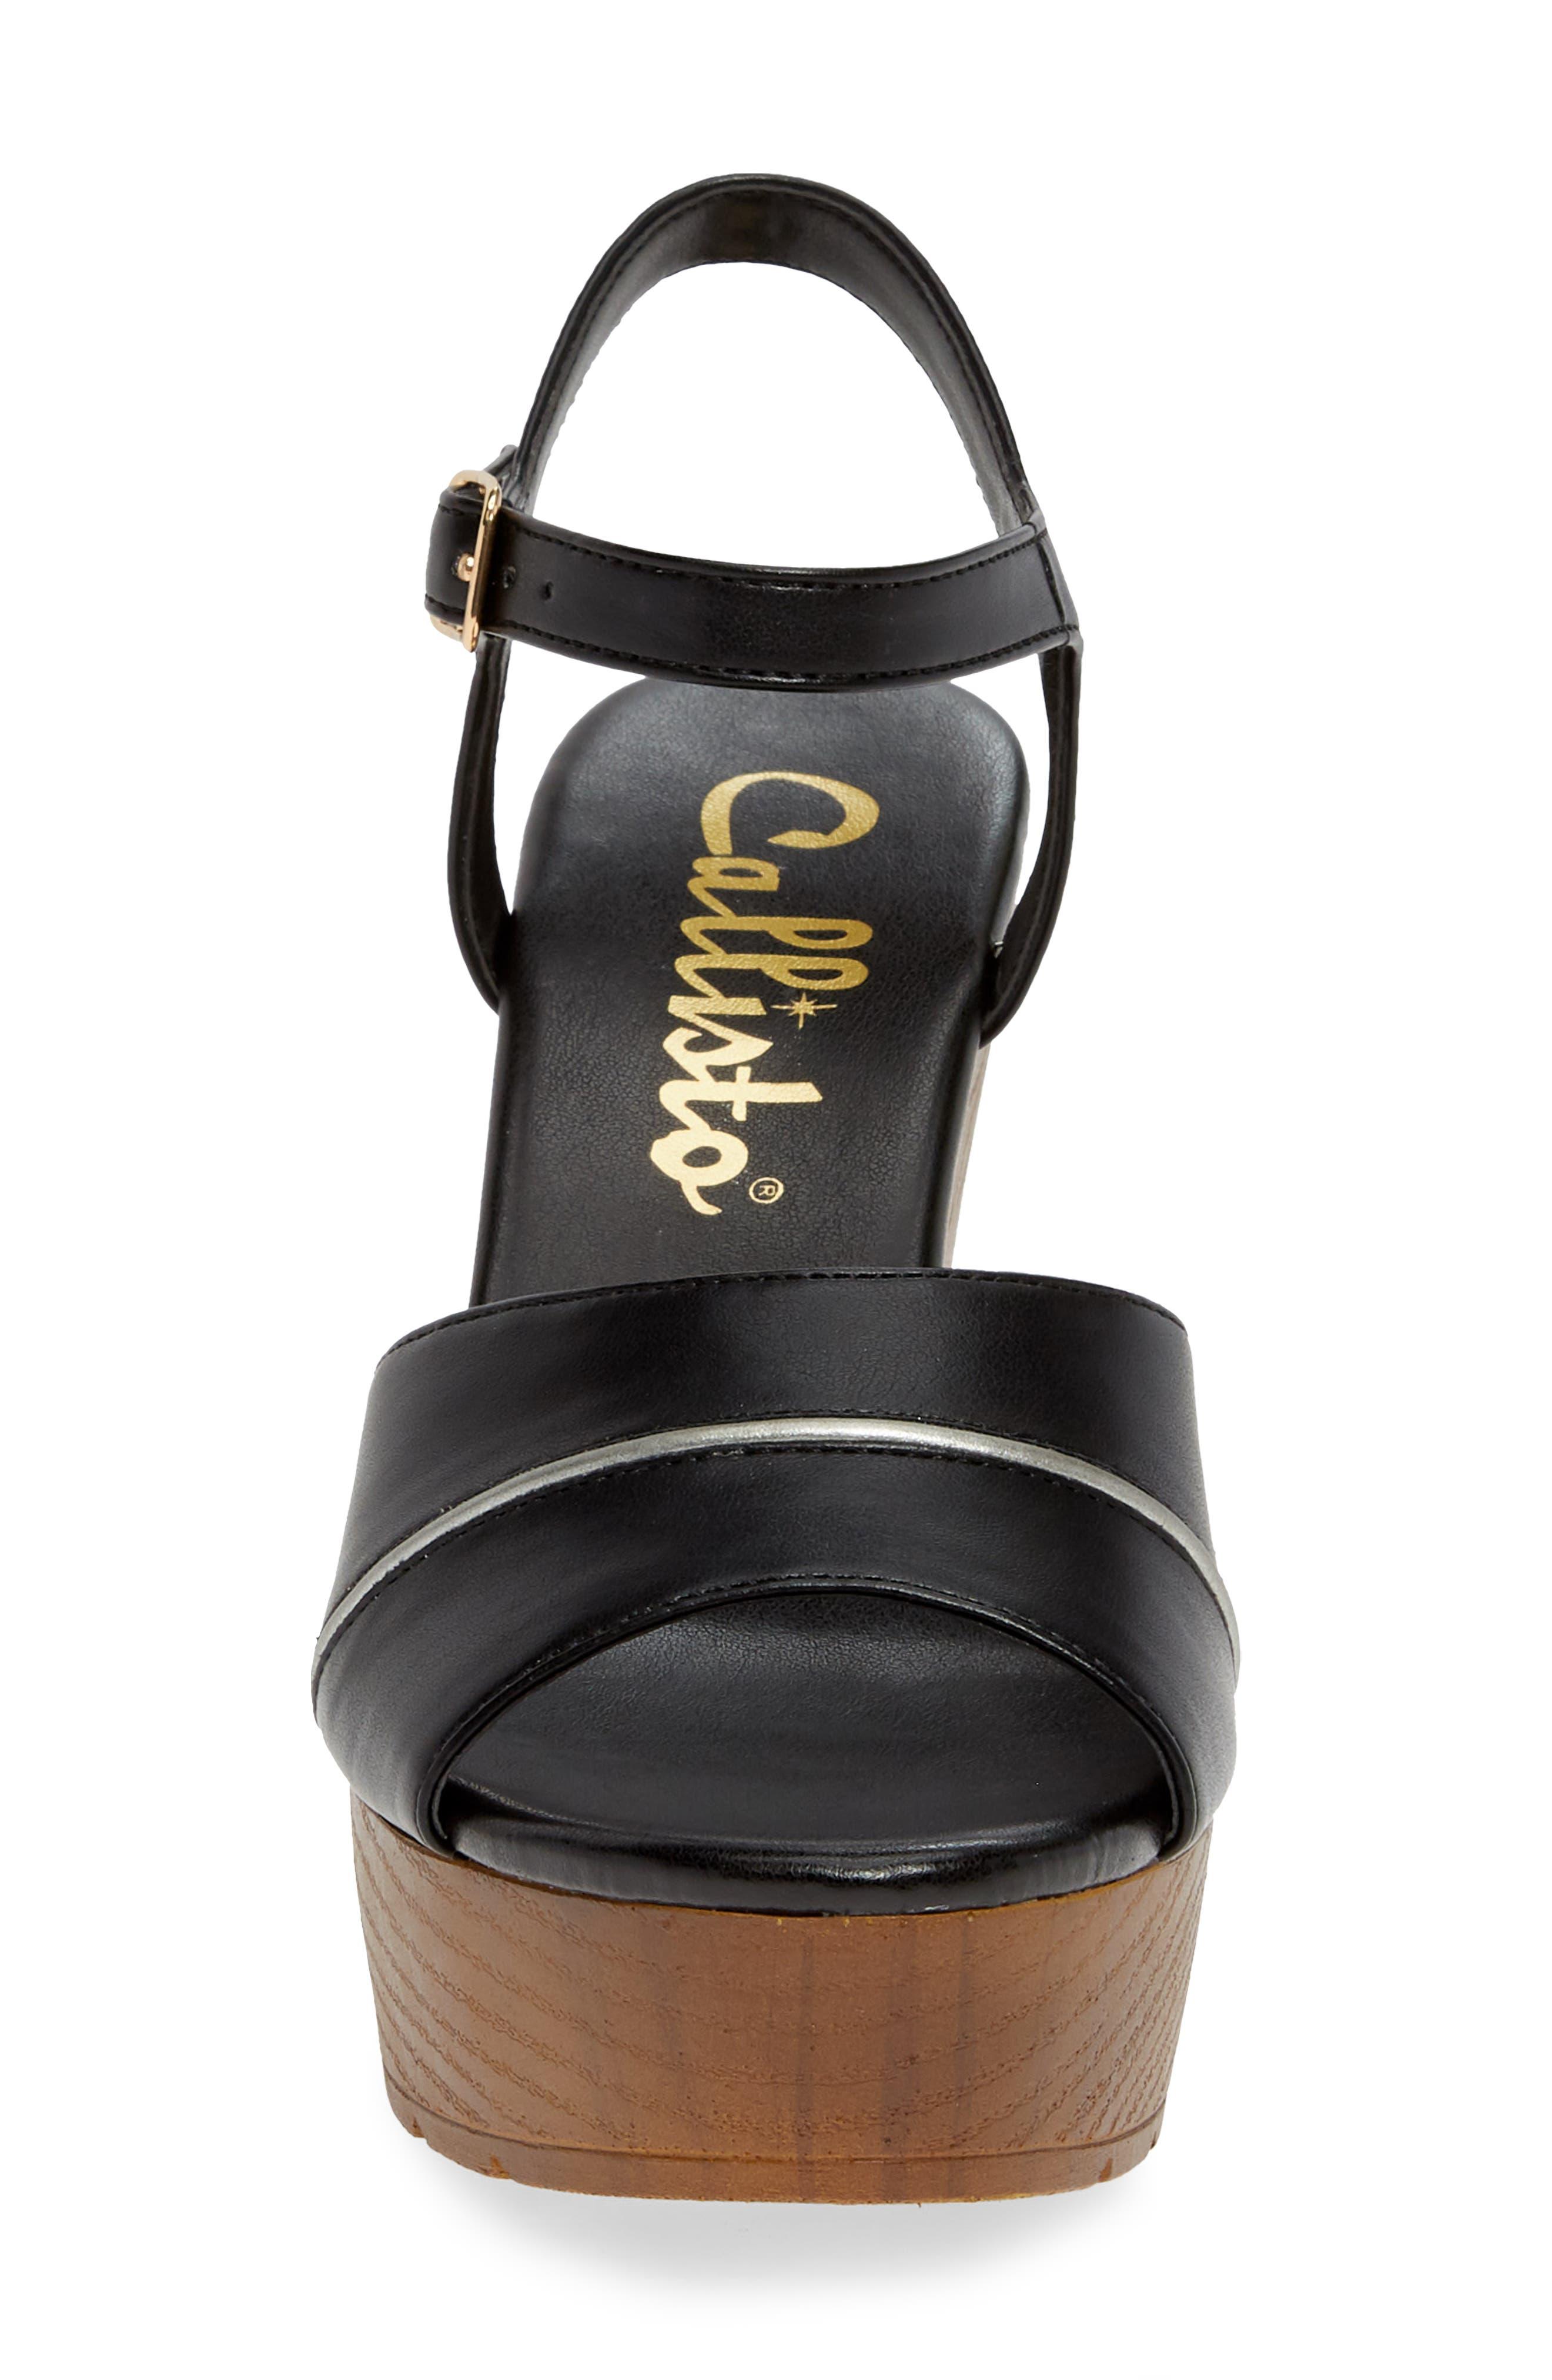 CALLISTO, Masalla Platform Wedge Sandal, Alternate thumbnail 4, color, BLACK FAUX LEATHER